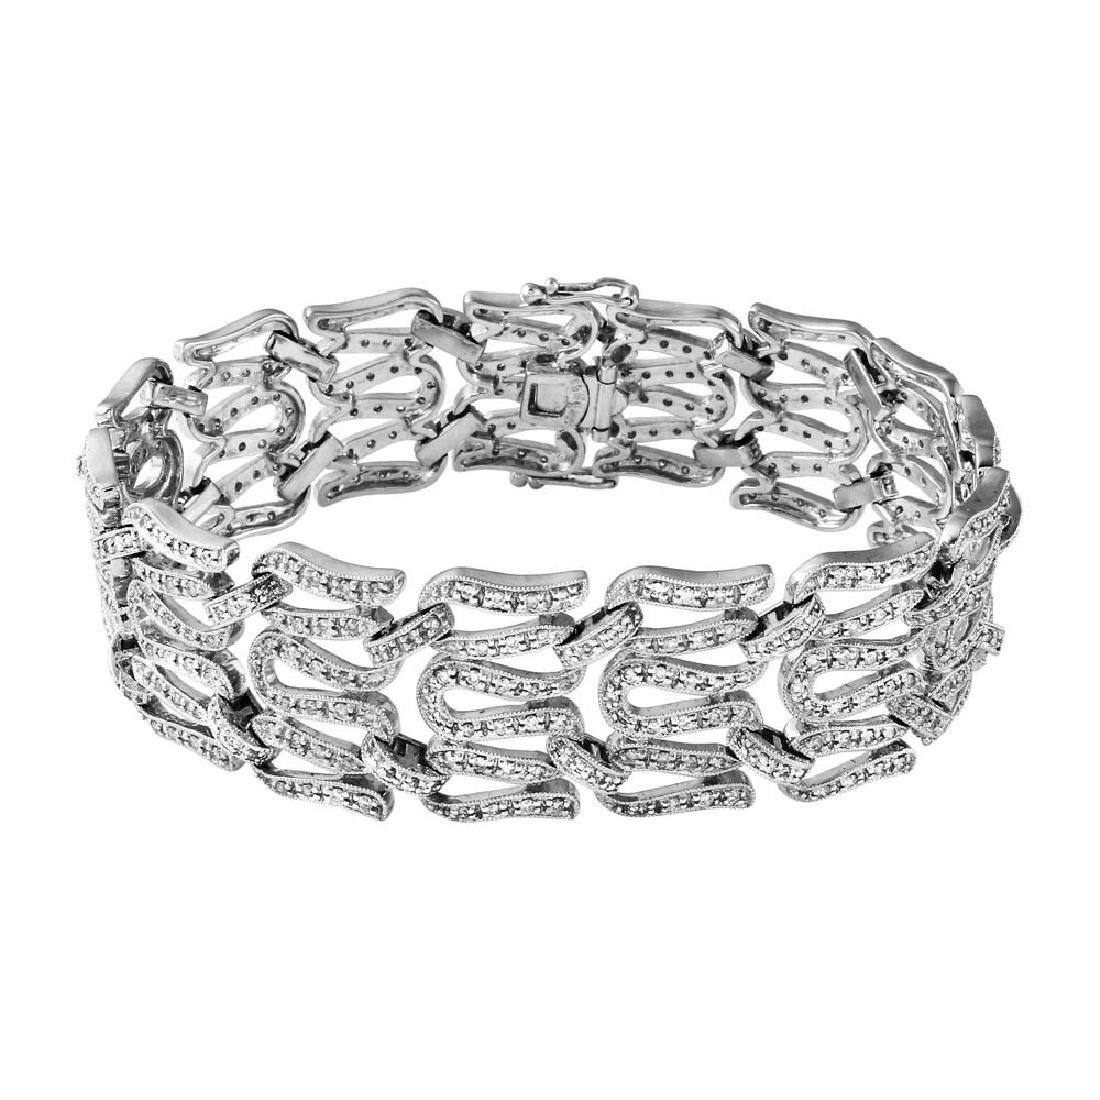 Genuine 2.55 TCW 18K White Gold Ladies Bracelet